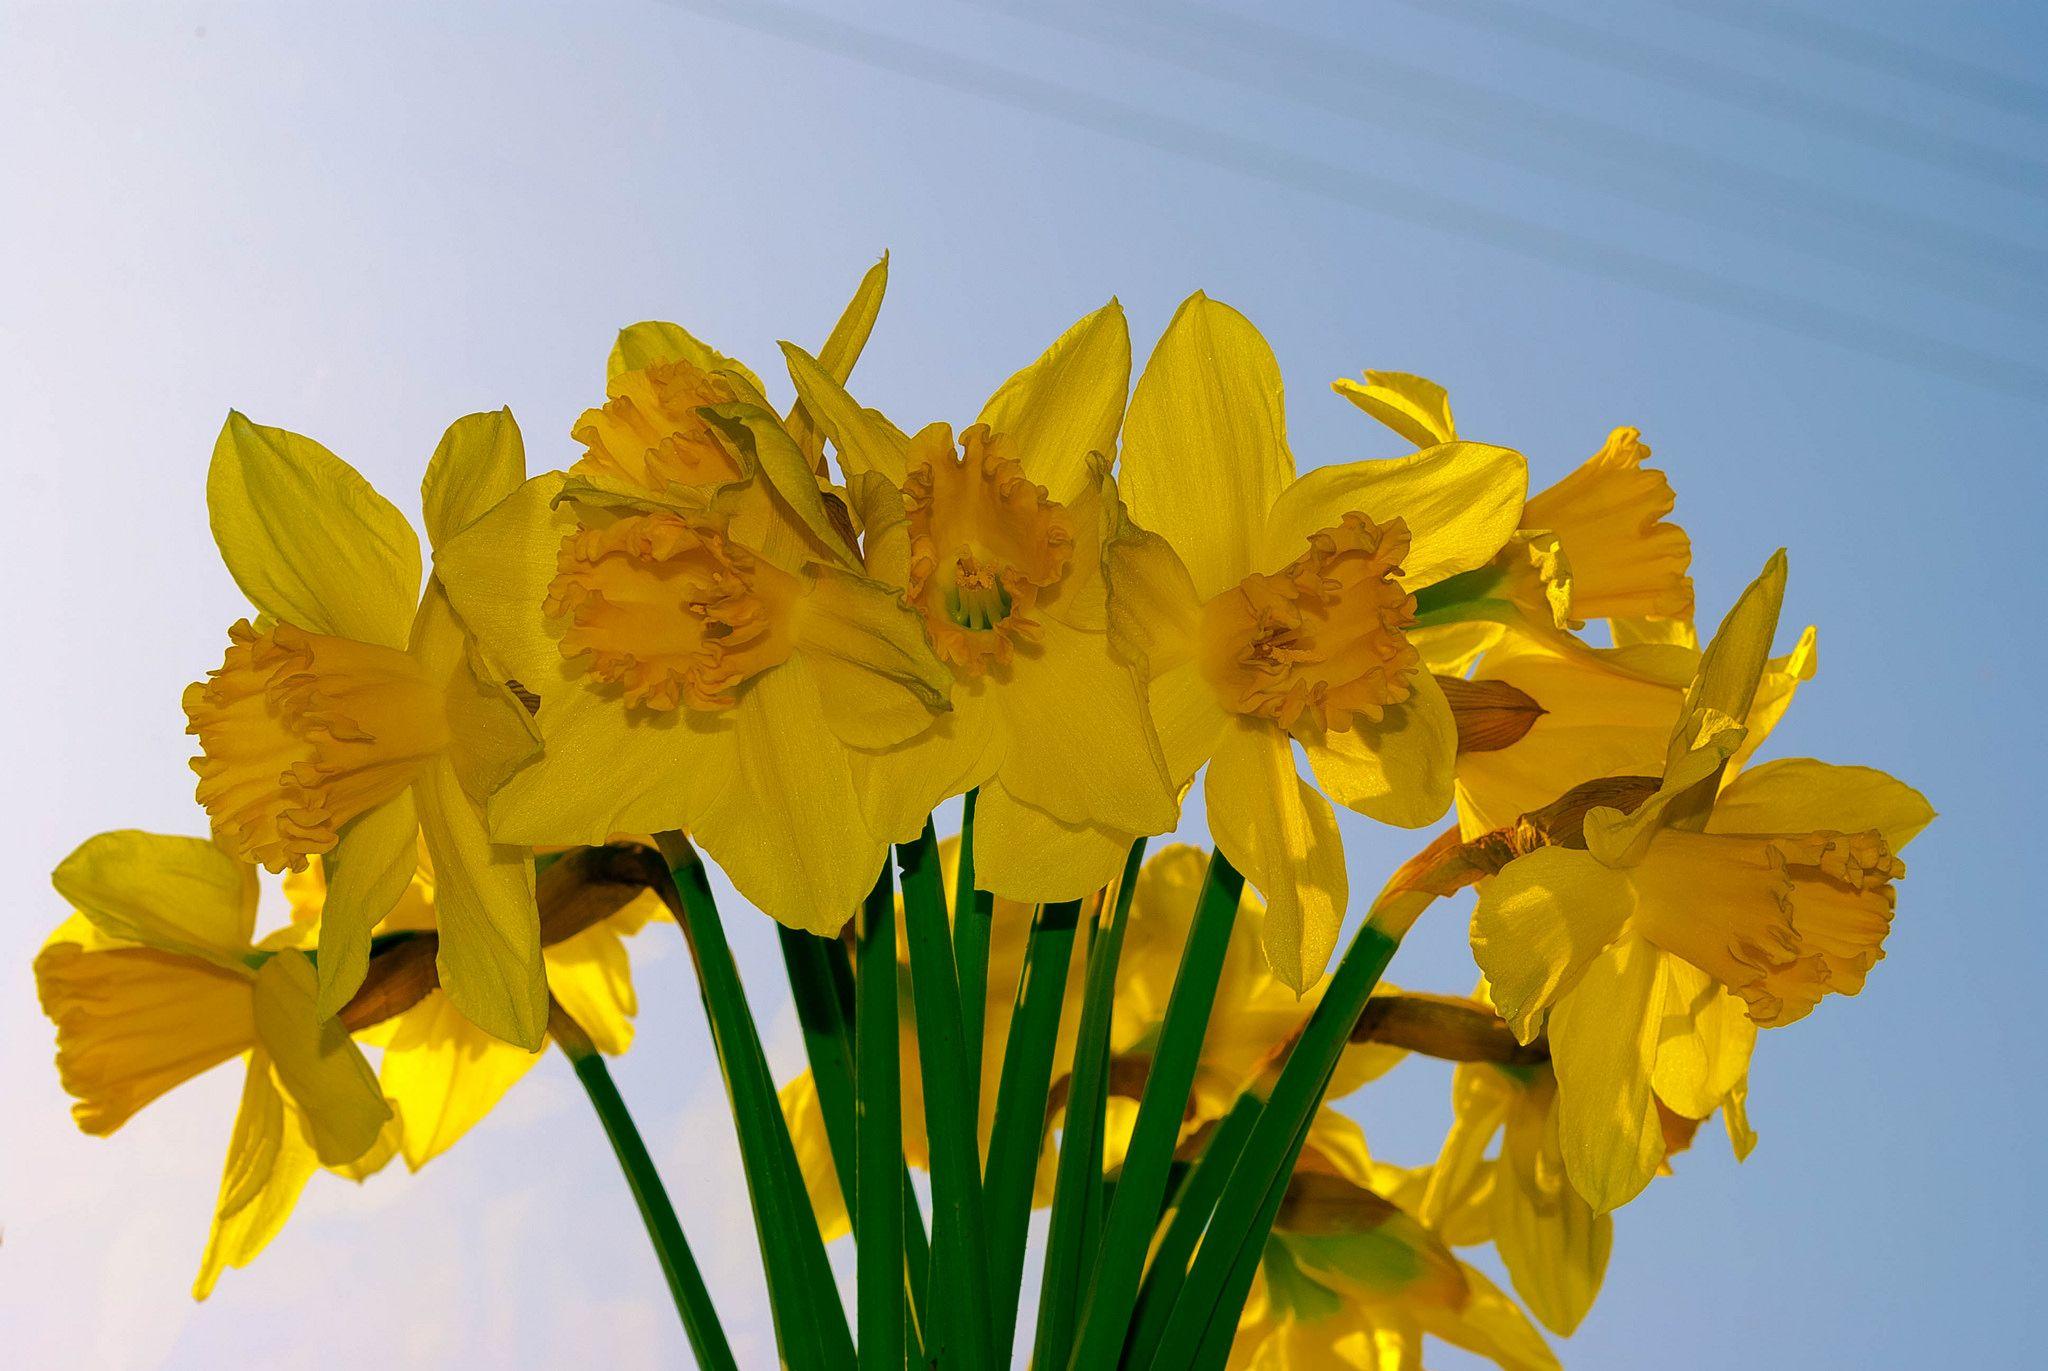 Blooming Daffs | Daffodils